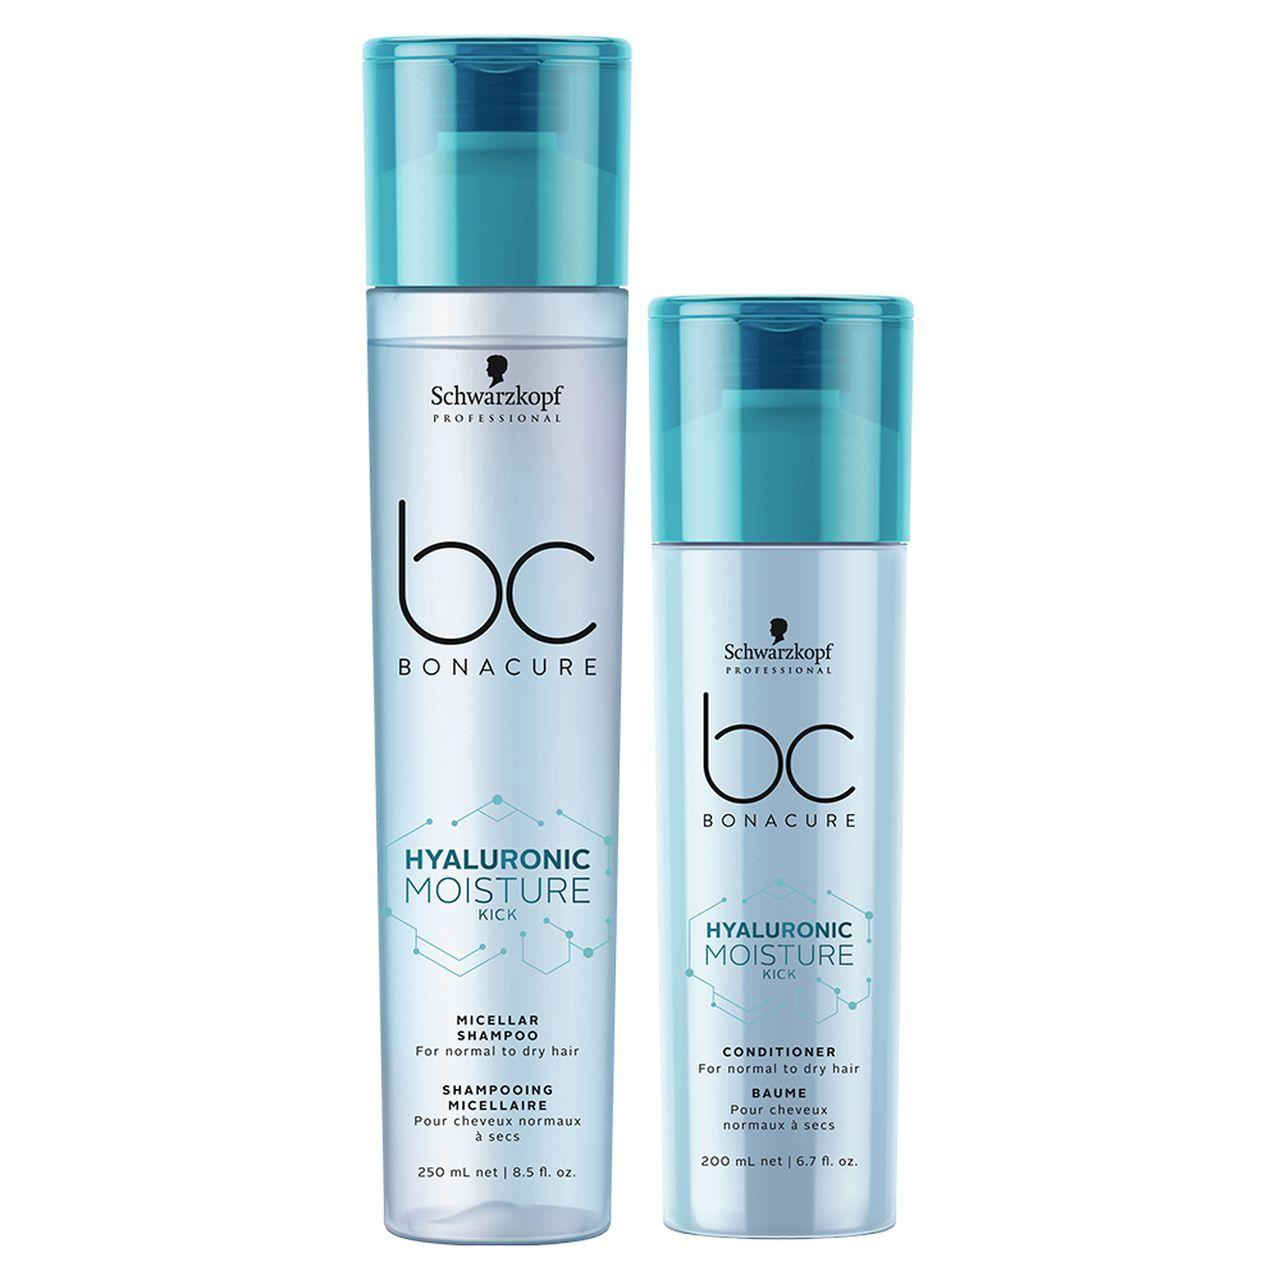 kit Moisture Kick Shampoo Micellar 250 ml + Condicionador Spray 200 ml